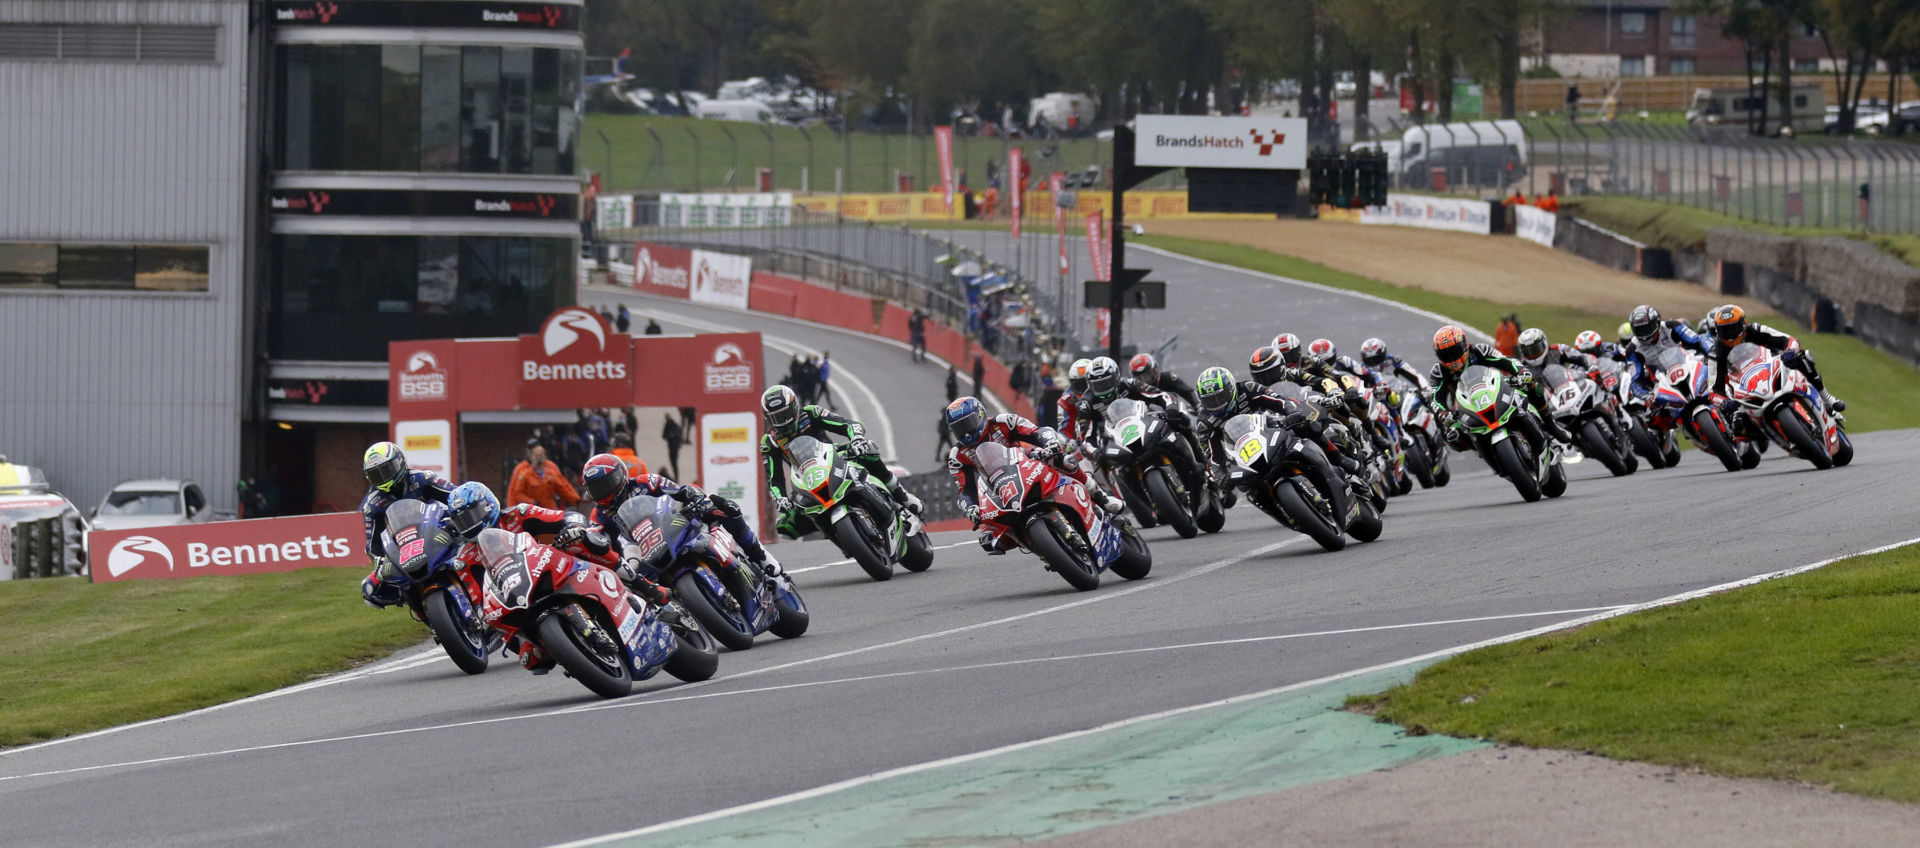 The start of a British Superbike race Sunday at Brands Hatch. Photo courtesy MSVR.